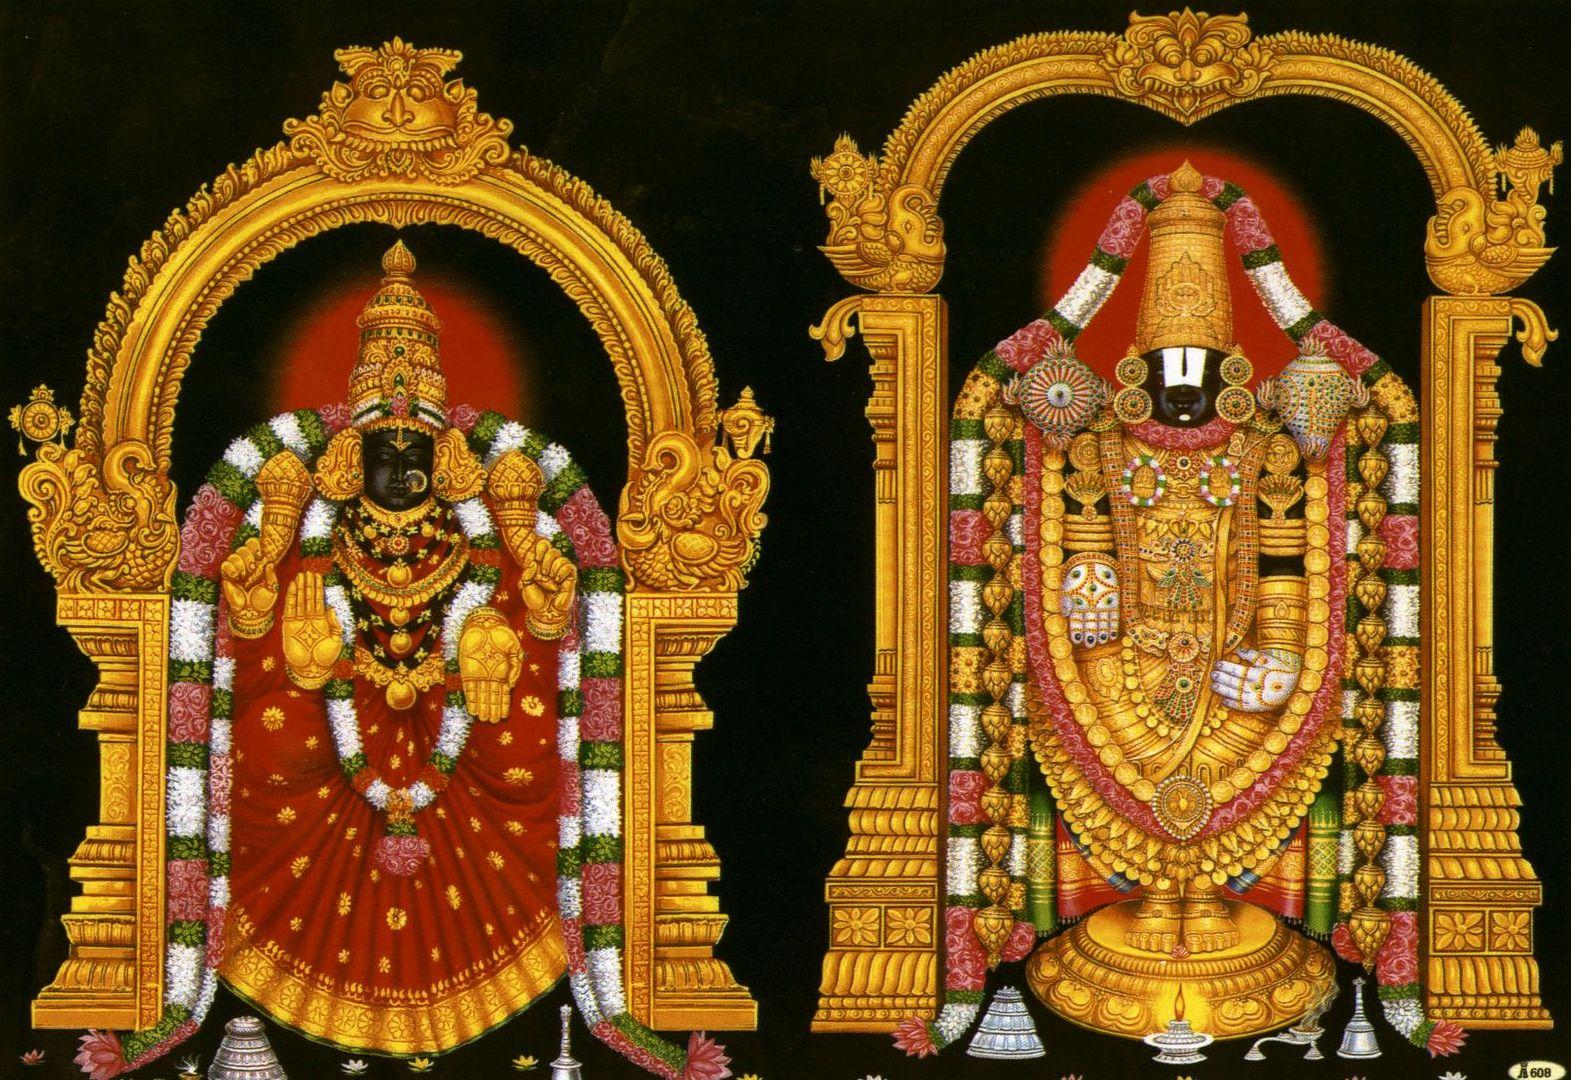 all about tirumala All about brahmotsavam: tirumala brahmotsavam is an annual festival celebrated for nine days in september and october at the tirumala venkateswara temple.